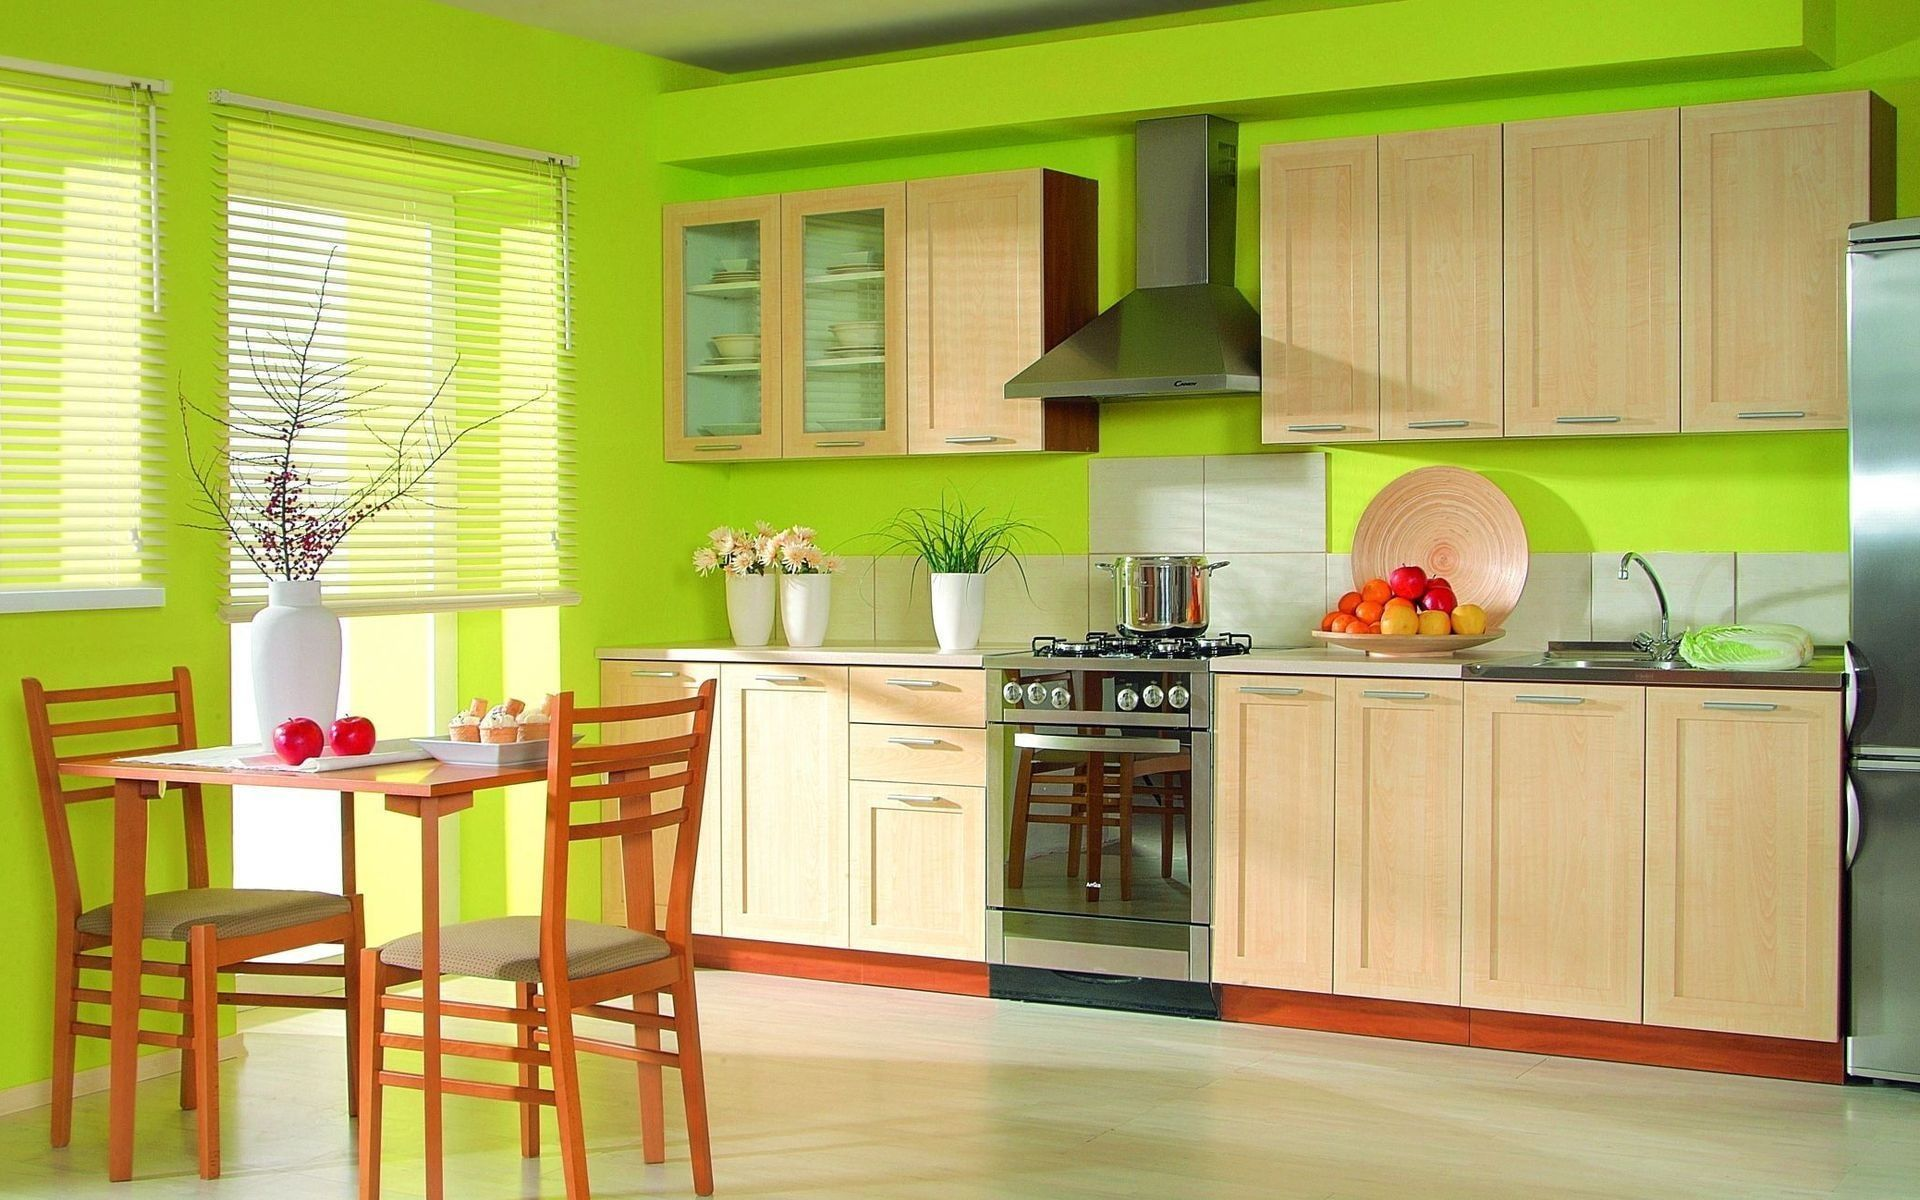 New Kitchen Furniture Kitchen Green Furniture Interior Design 1080p Wallpaper Hdwallpaper Desk Green Kitchen Designs Kitchen Design Decor Rustic Kitchen